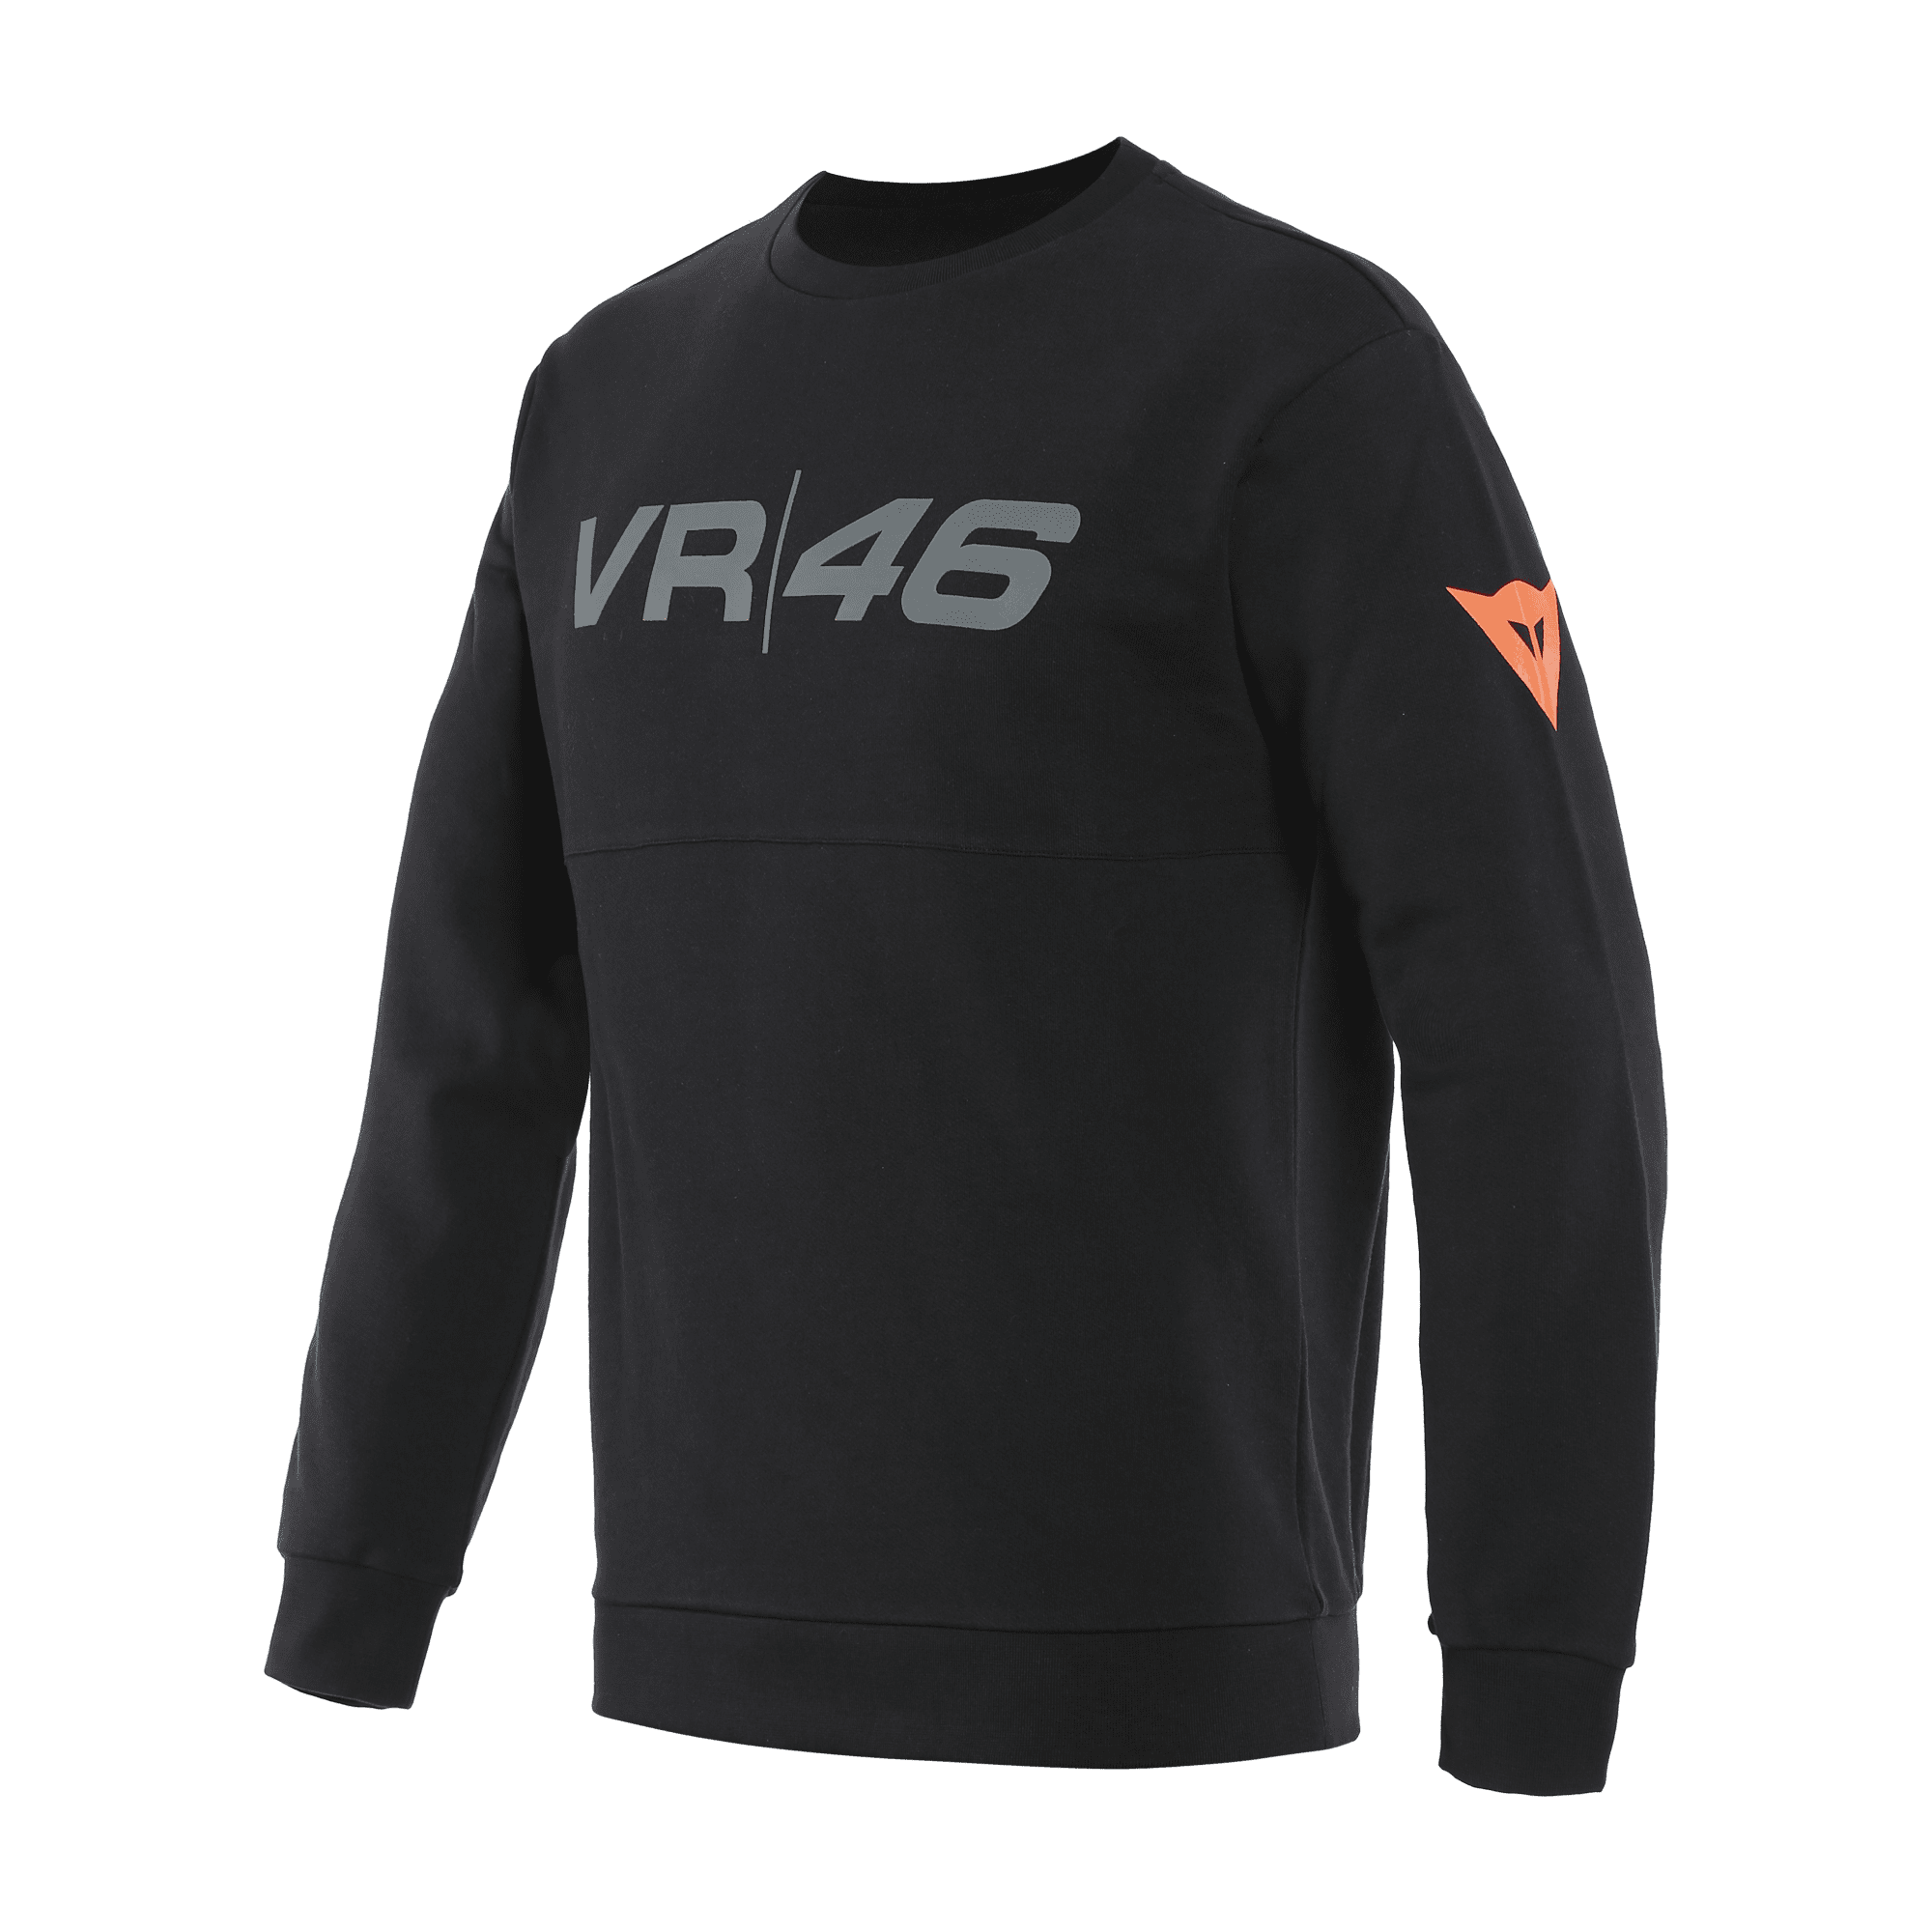 Sweatshirt VR46 Team